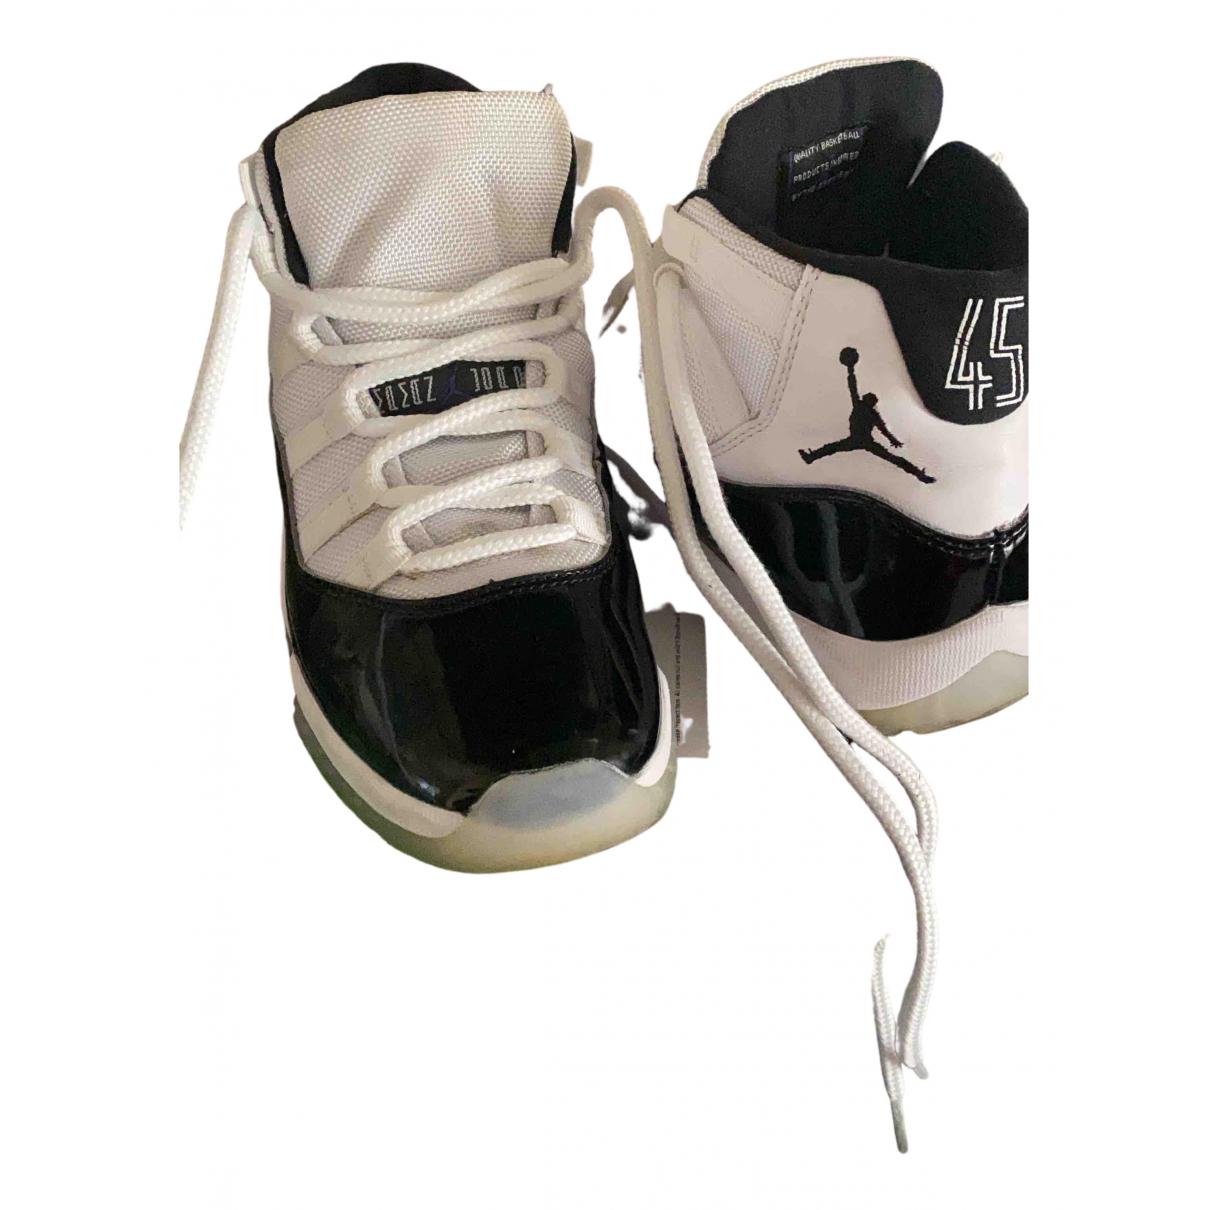 Jordan - Baskets Air Jordan 11 pour femme - blanc